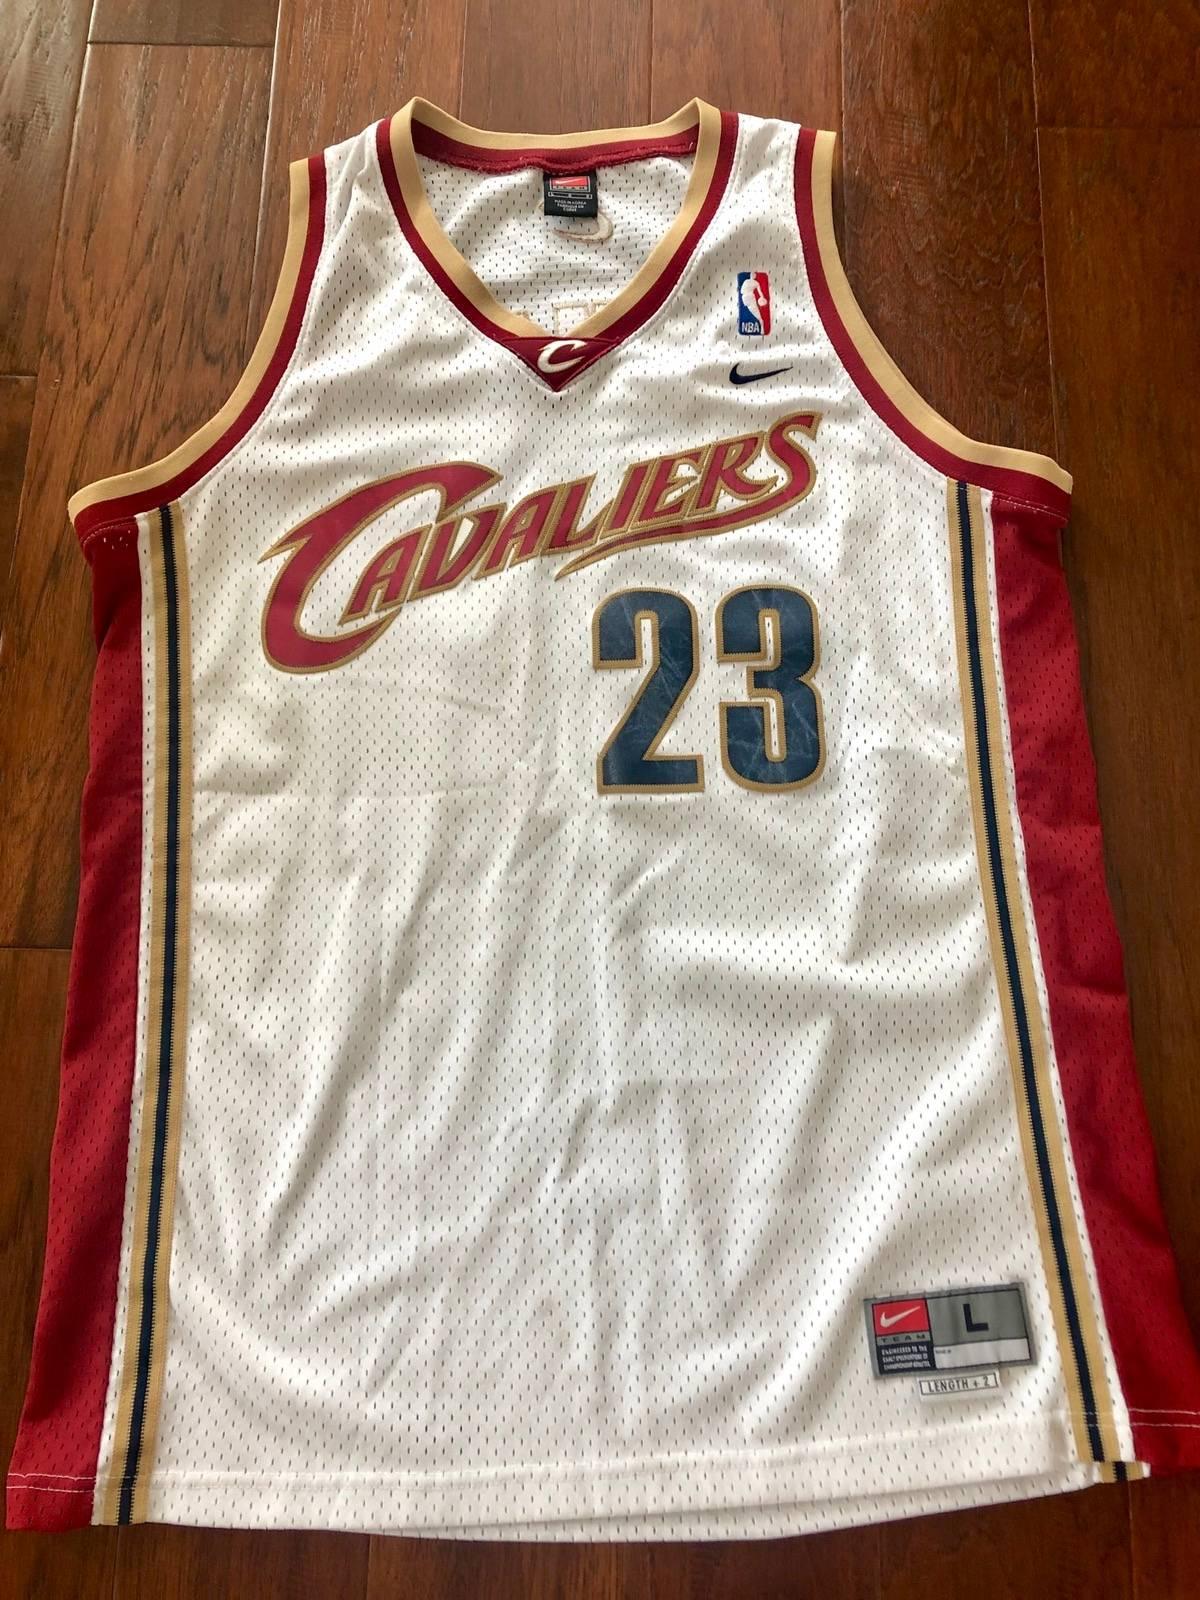 wholesale dealer 292aa eed0d Nike Vintage Nike Lebron James Cavs Jersey Size L $45